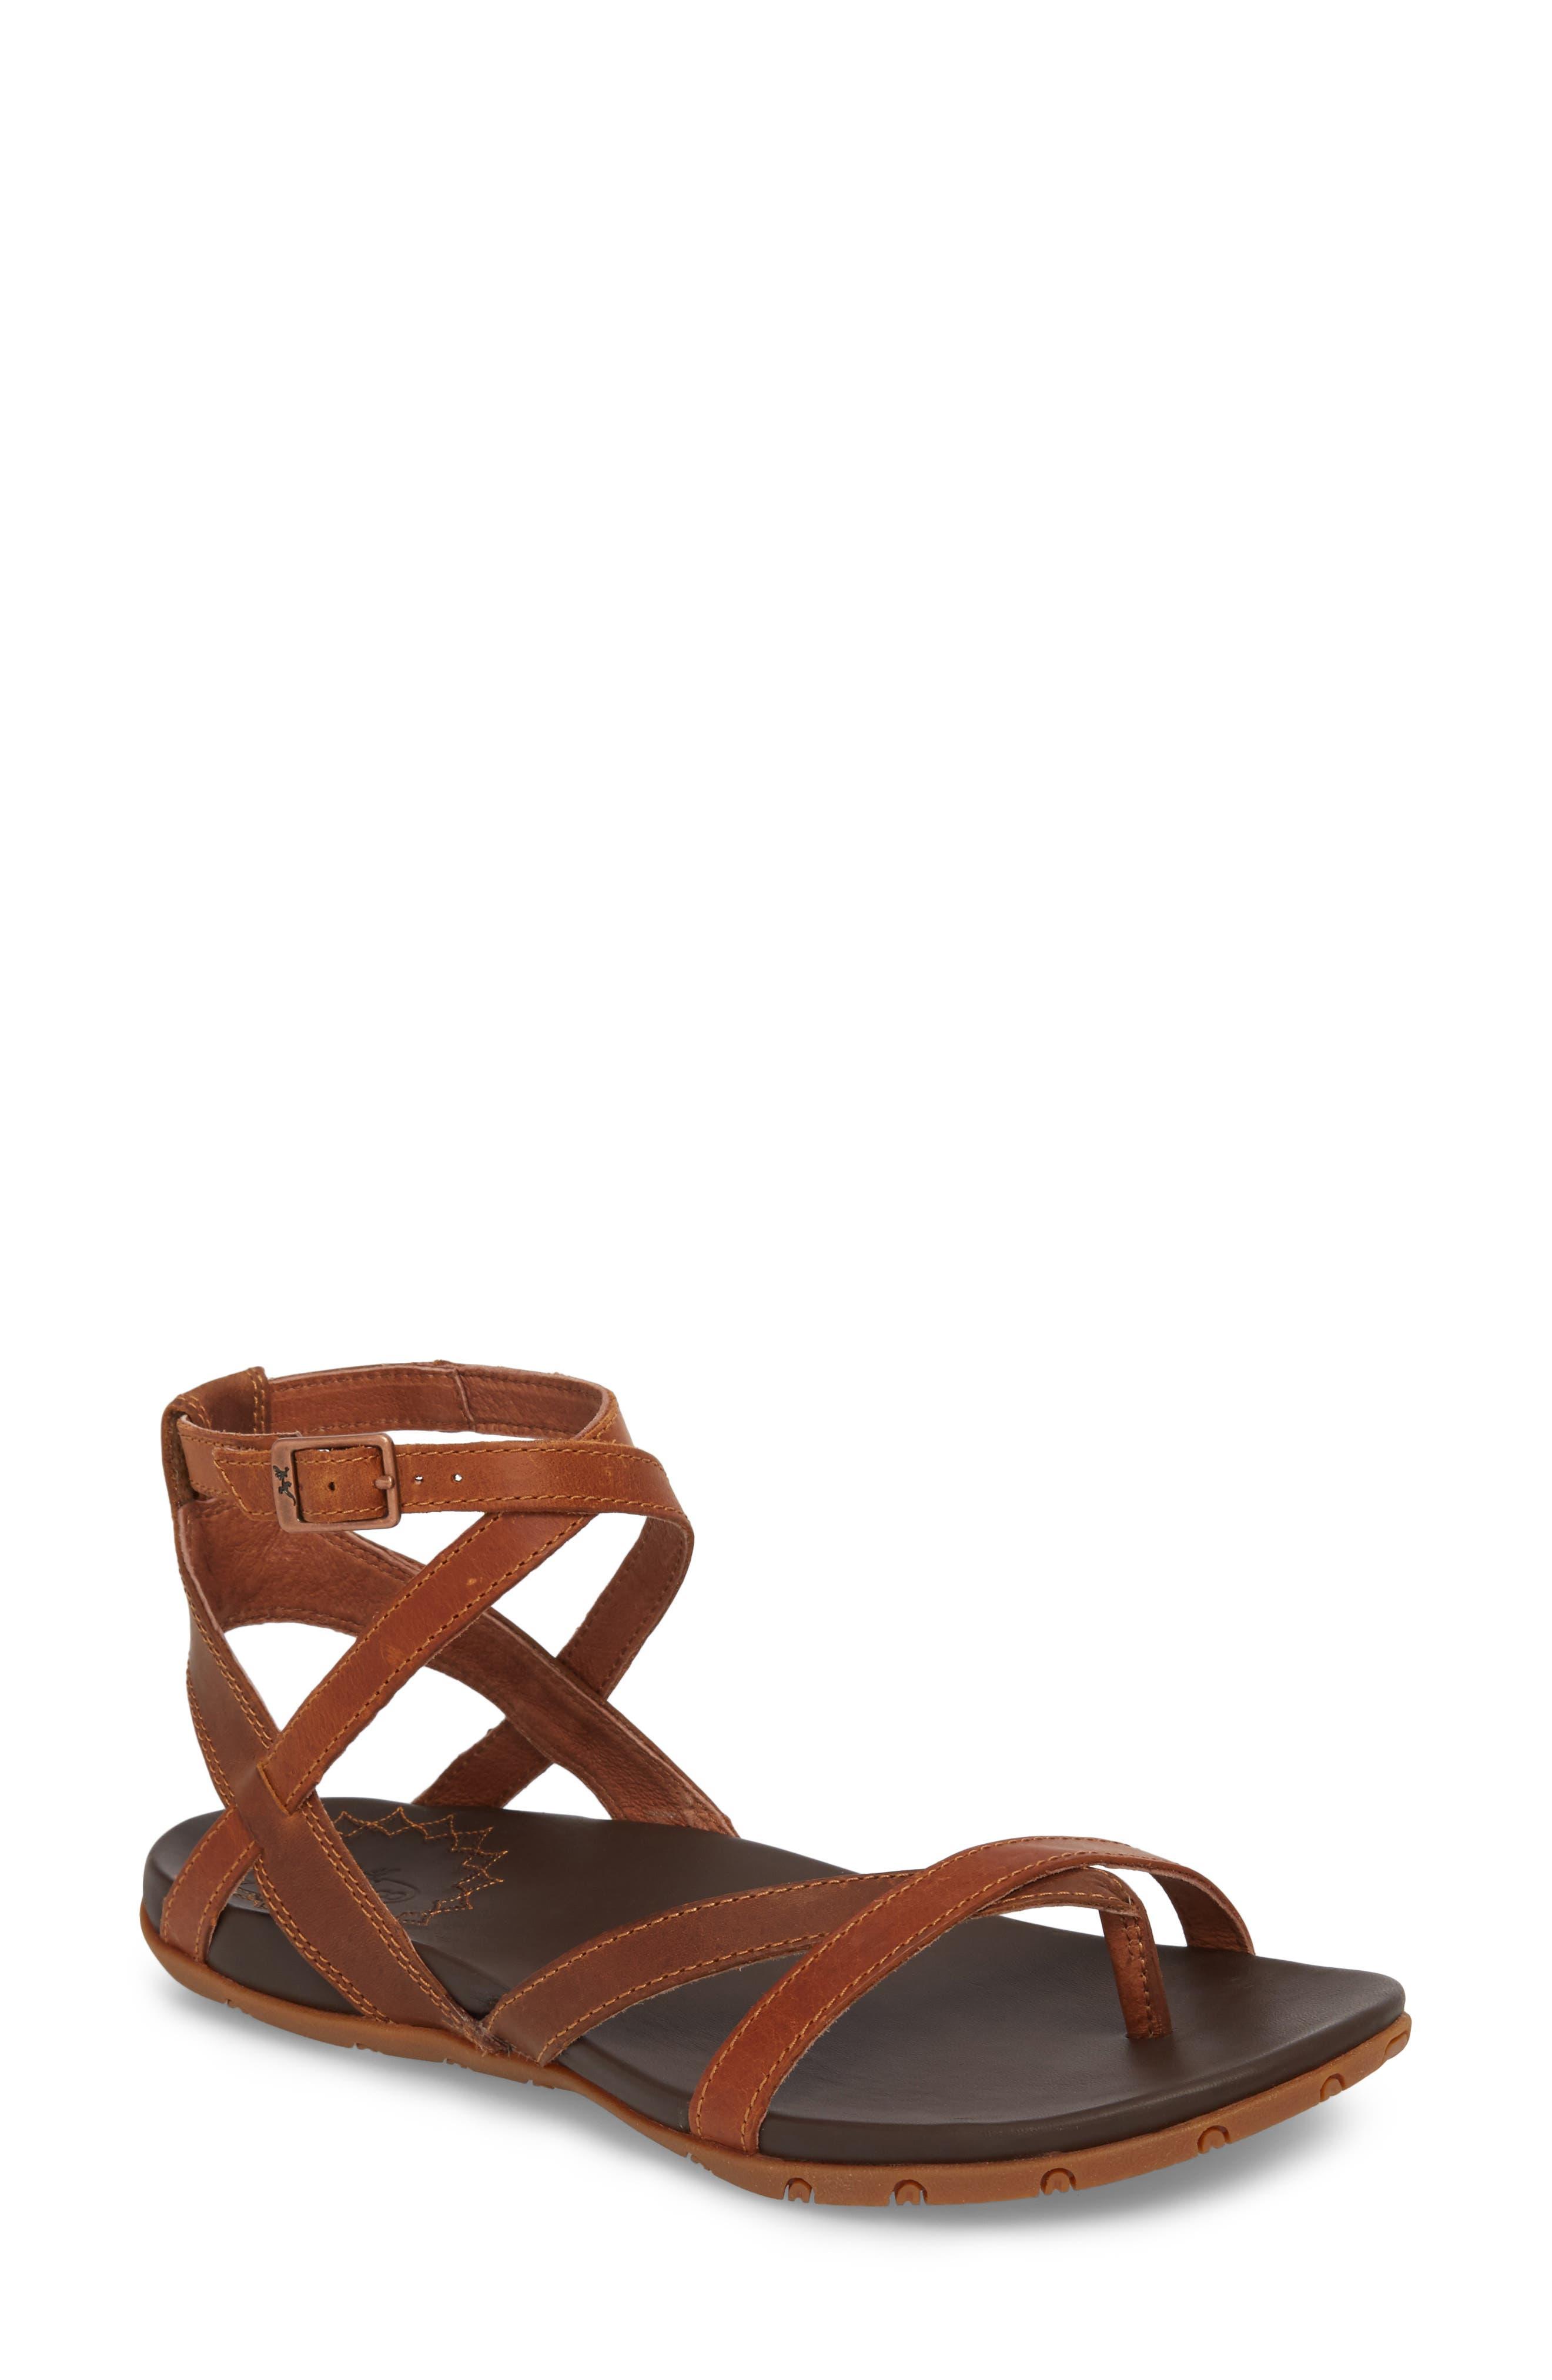 Juniper Sandal,                         Main,                         color, Rust Leather